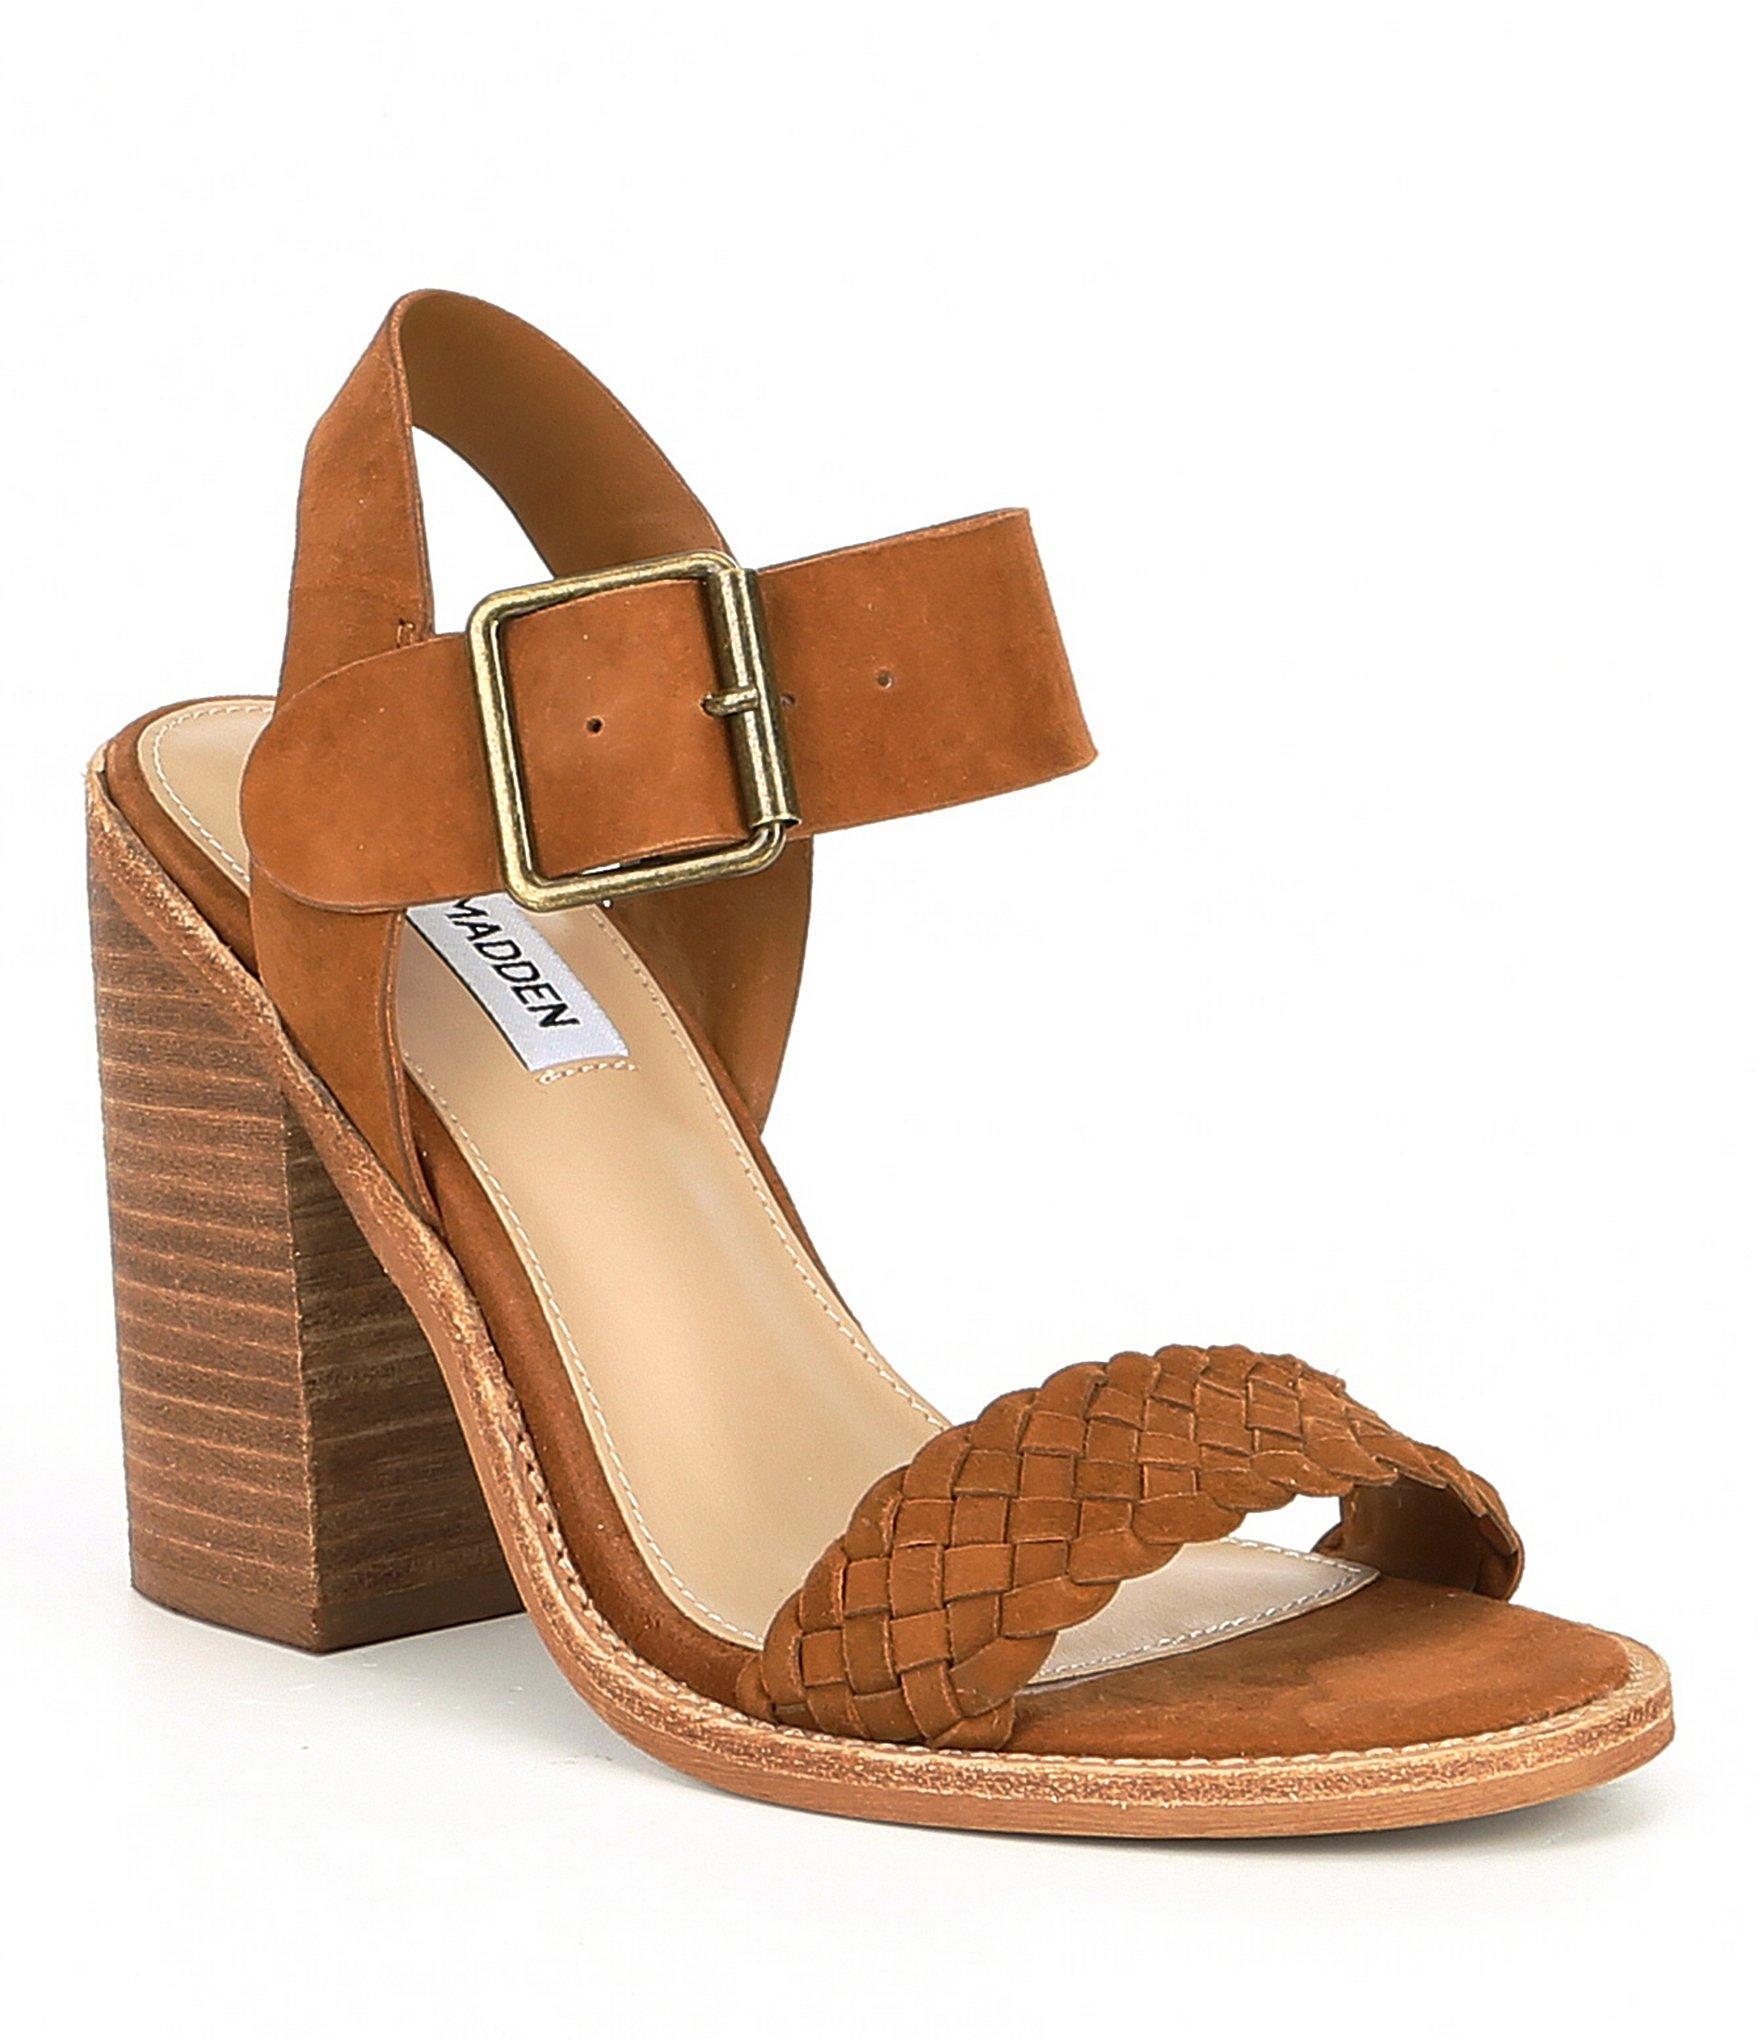 a4ad4390ba8 Lyst - Steve Madden Cadence Suede Block-heel Sandals in Brown